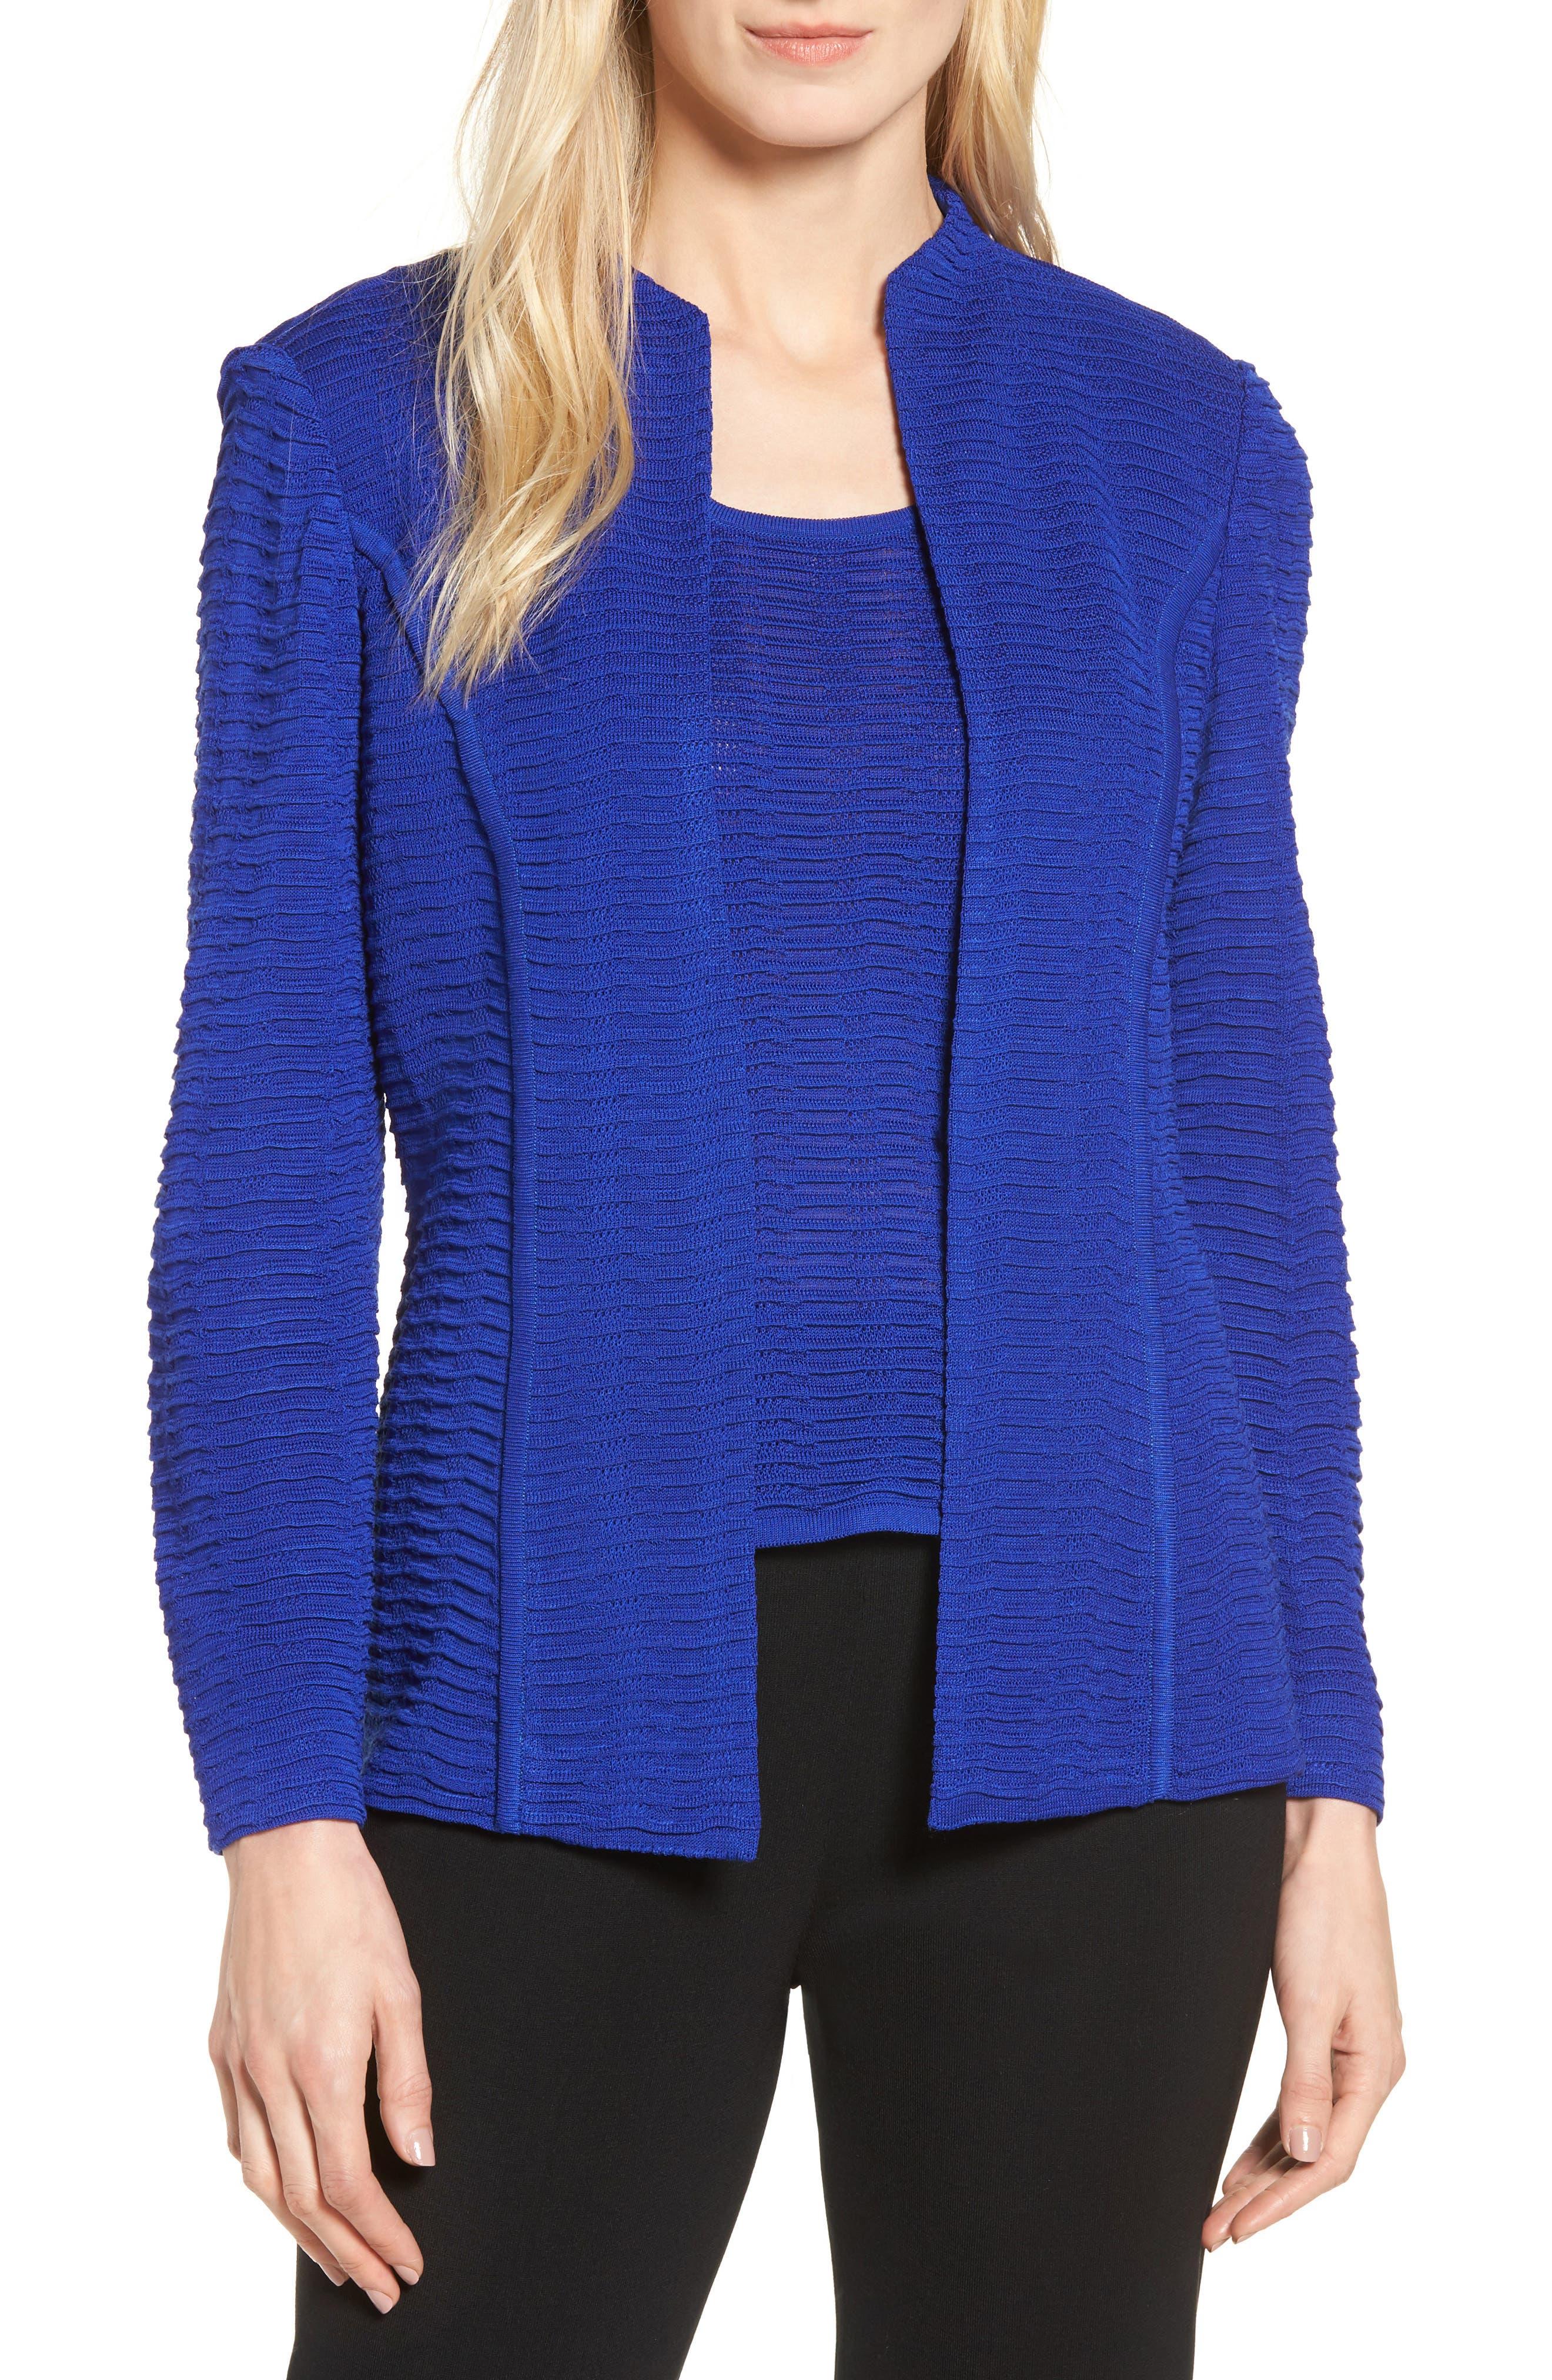 Ripple Knit Jacket,                         Main,                         color,